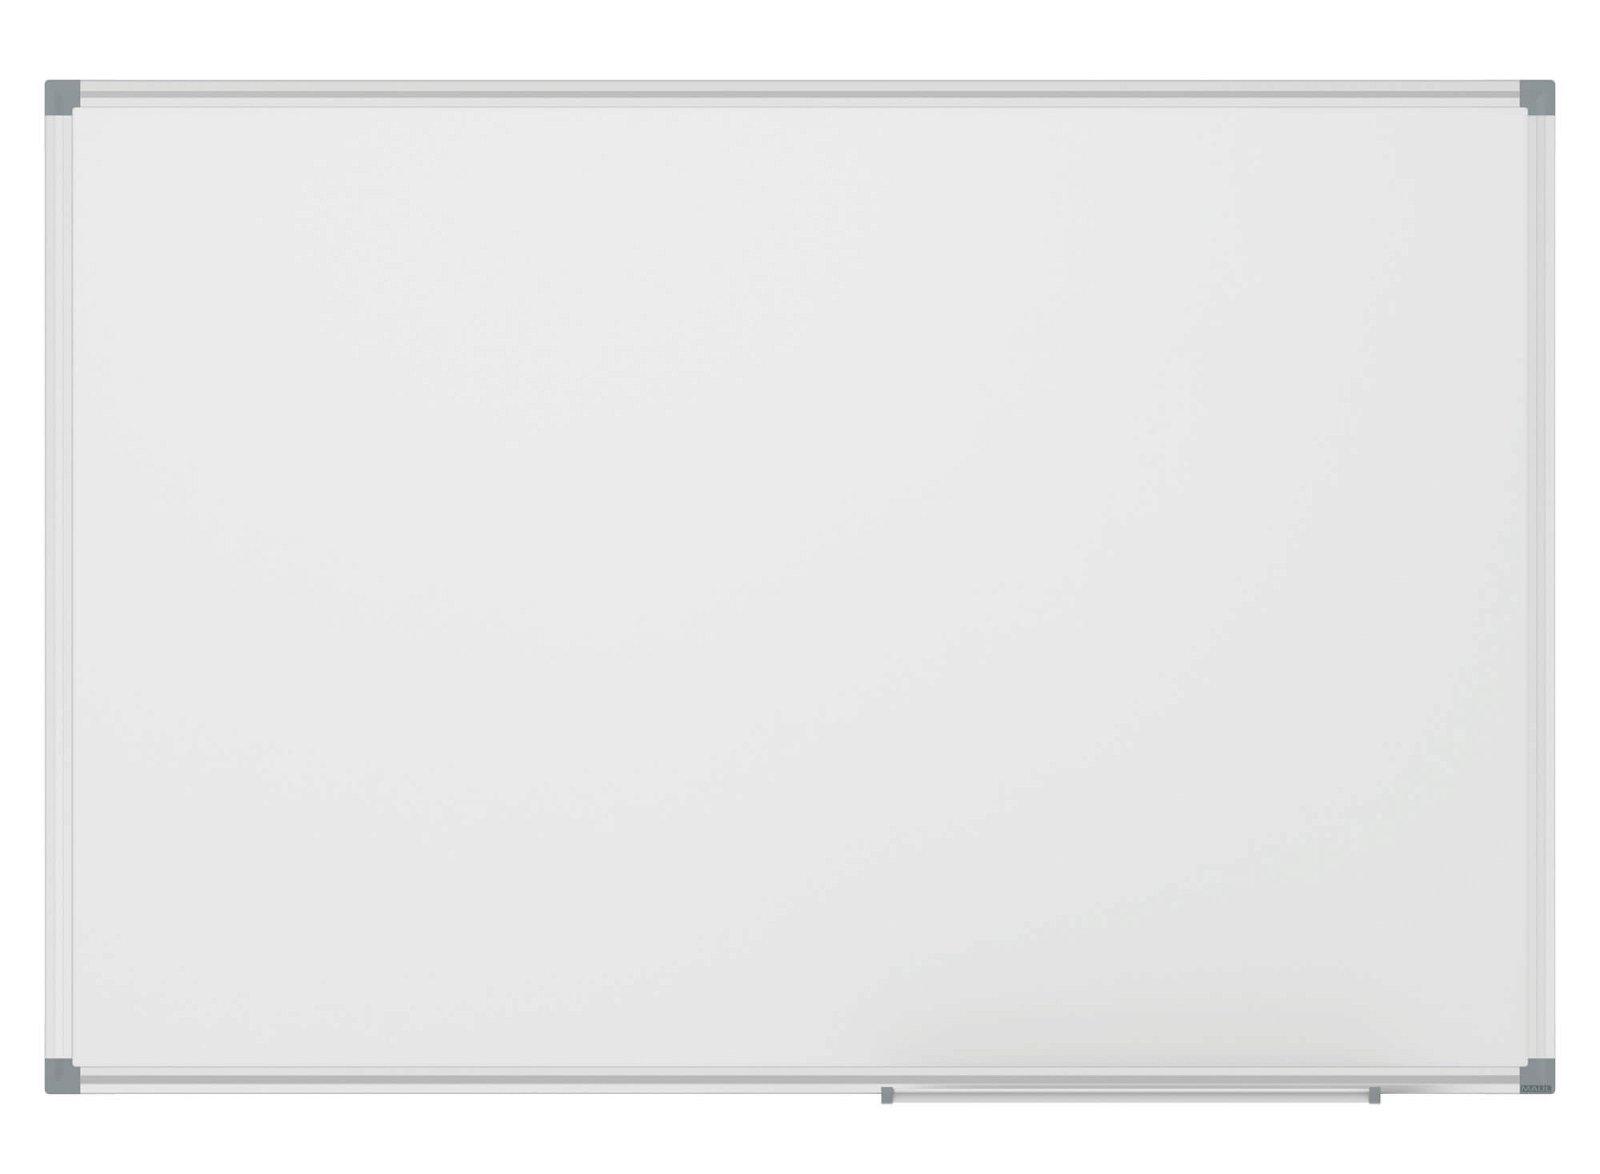 Whiteboard MAULstandard, 90x120 cm, grau